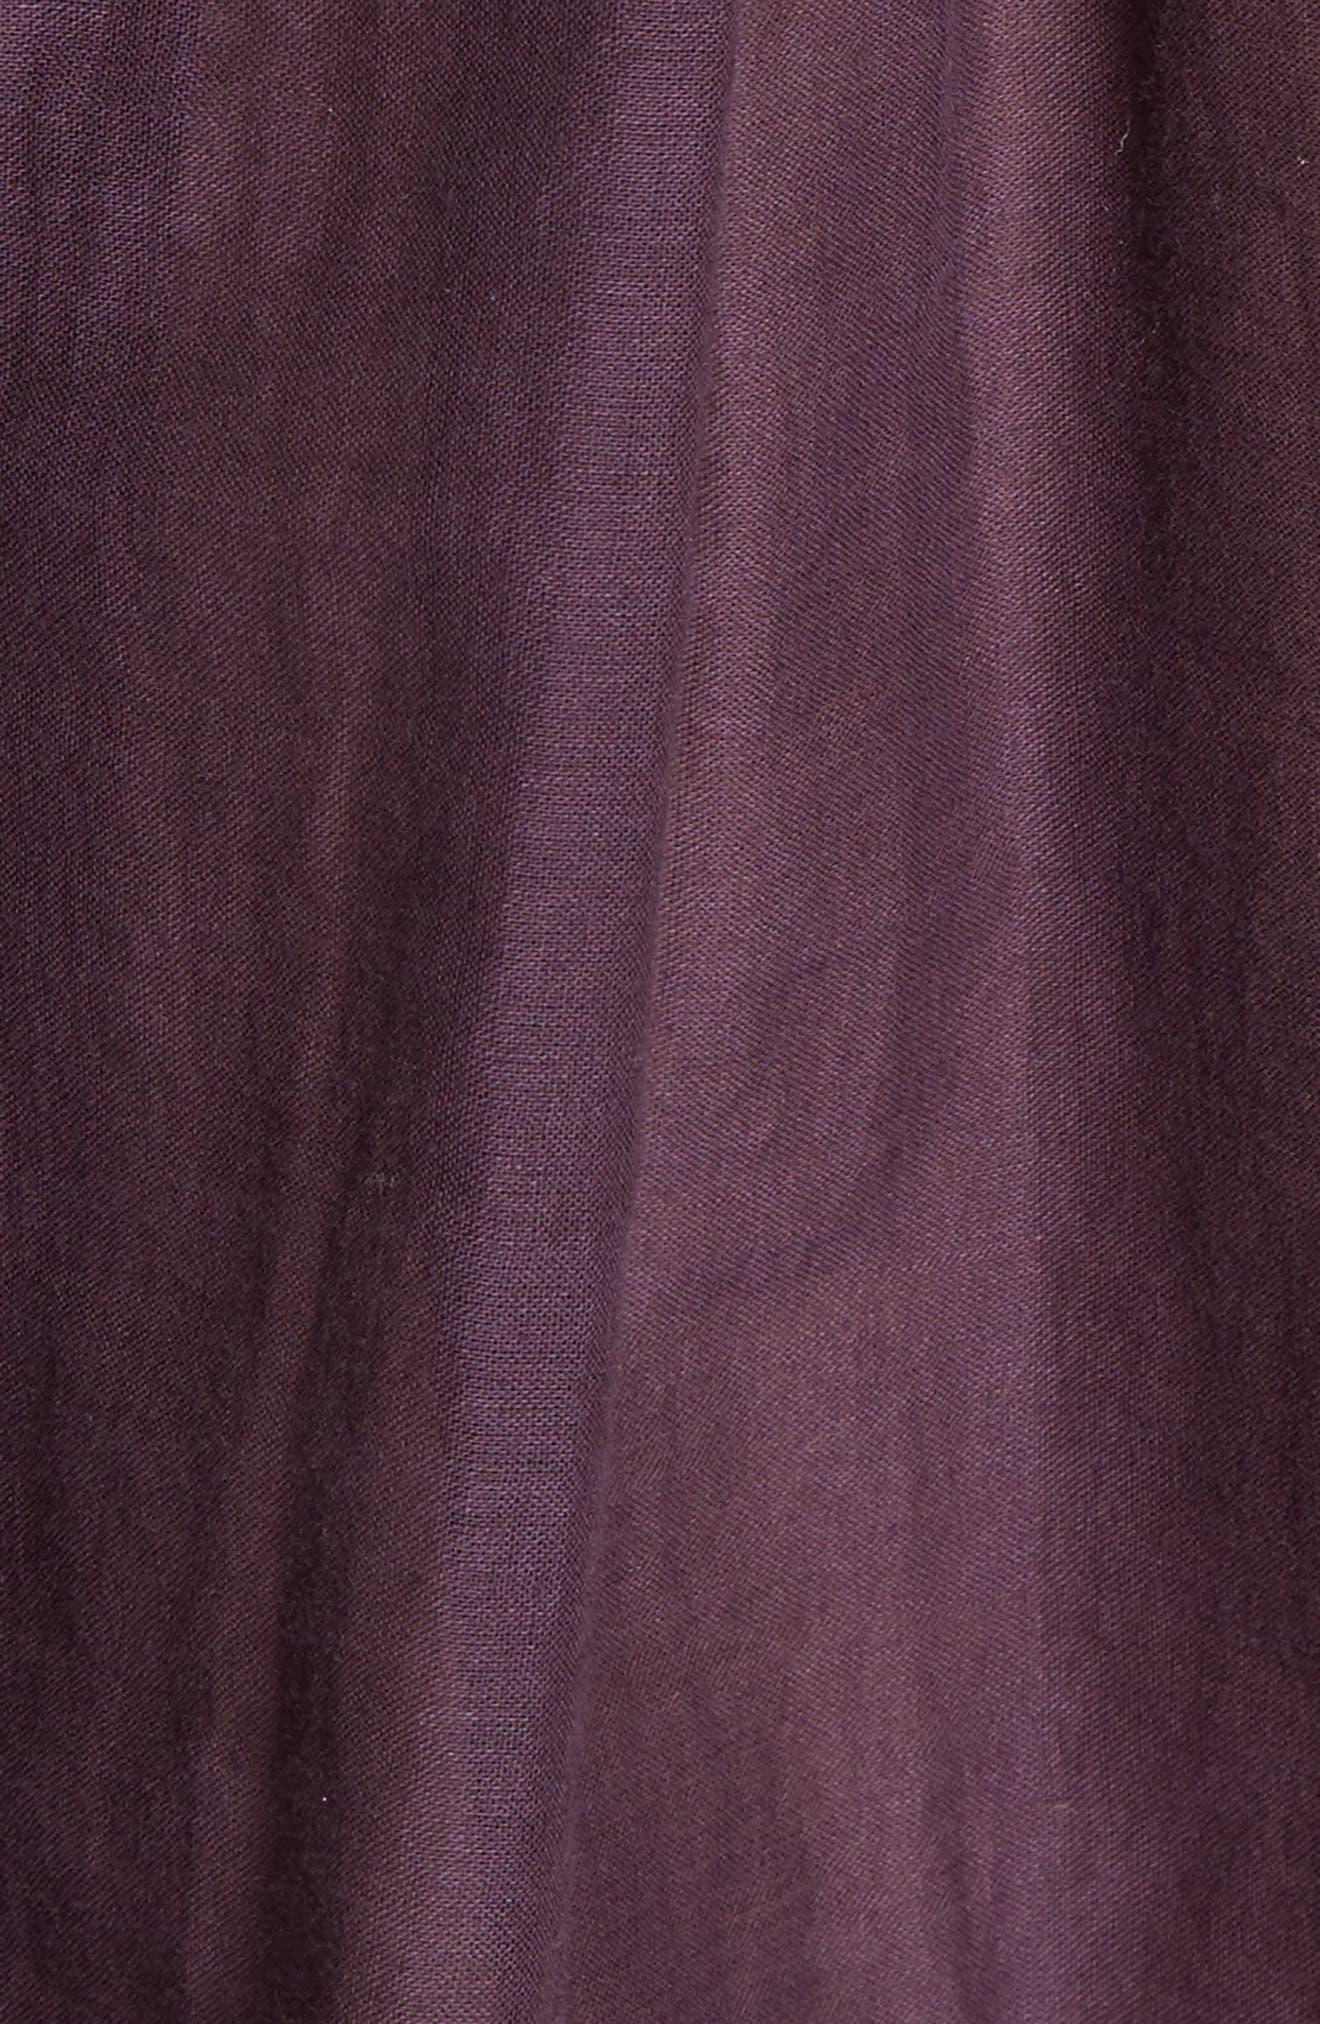 Shimla Embroidered Blouse,                             Alternate thumbnail 5, color,                             516